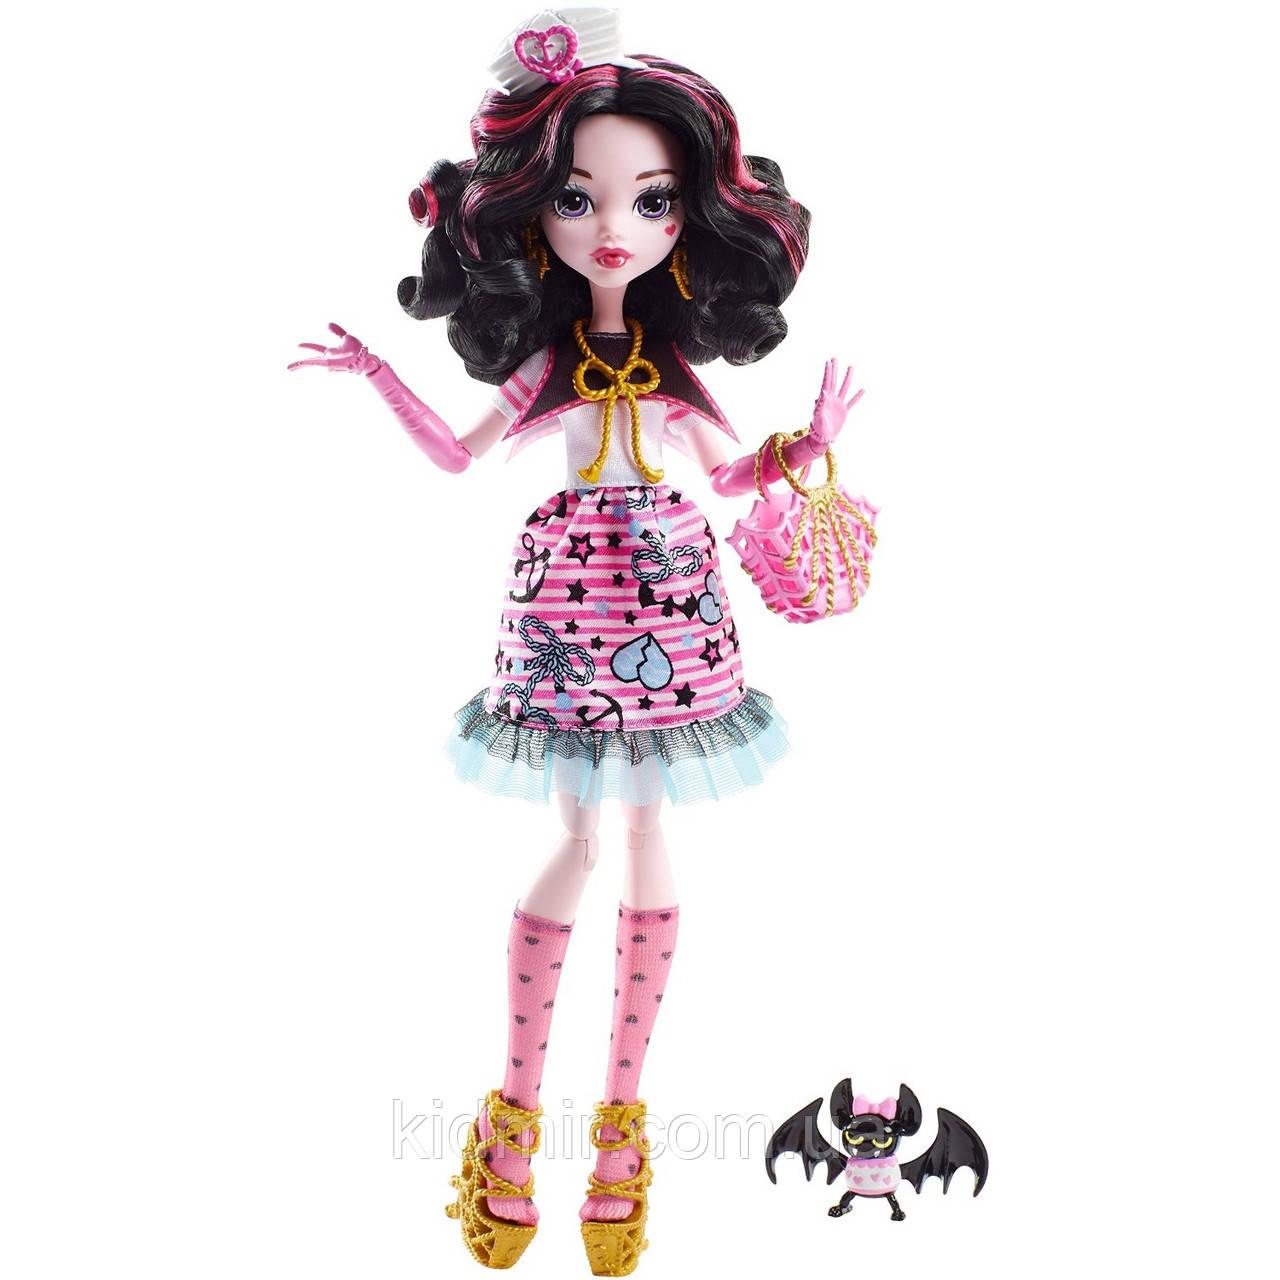 Кукла Monster High Дракулаура (Draculaura) из серии Shriek Wrecked Монстр Хай